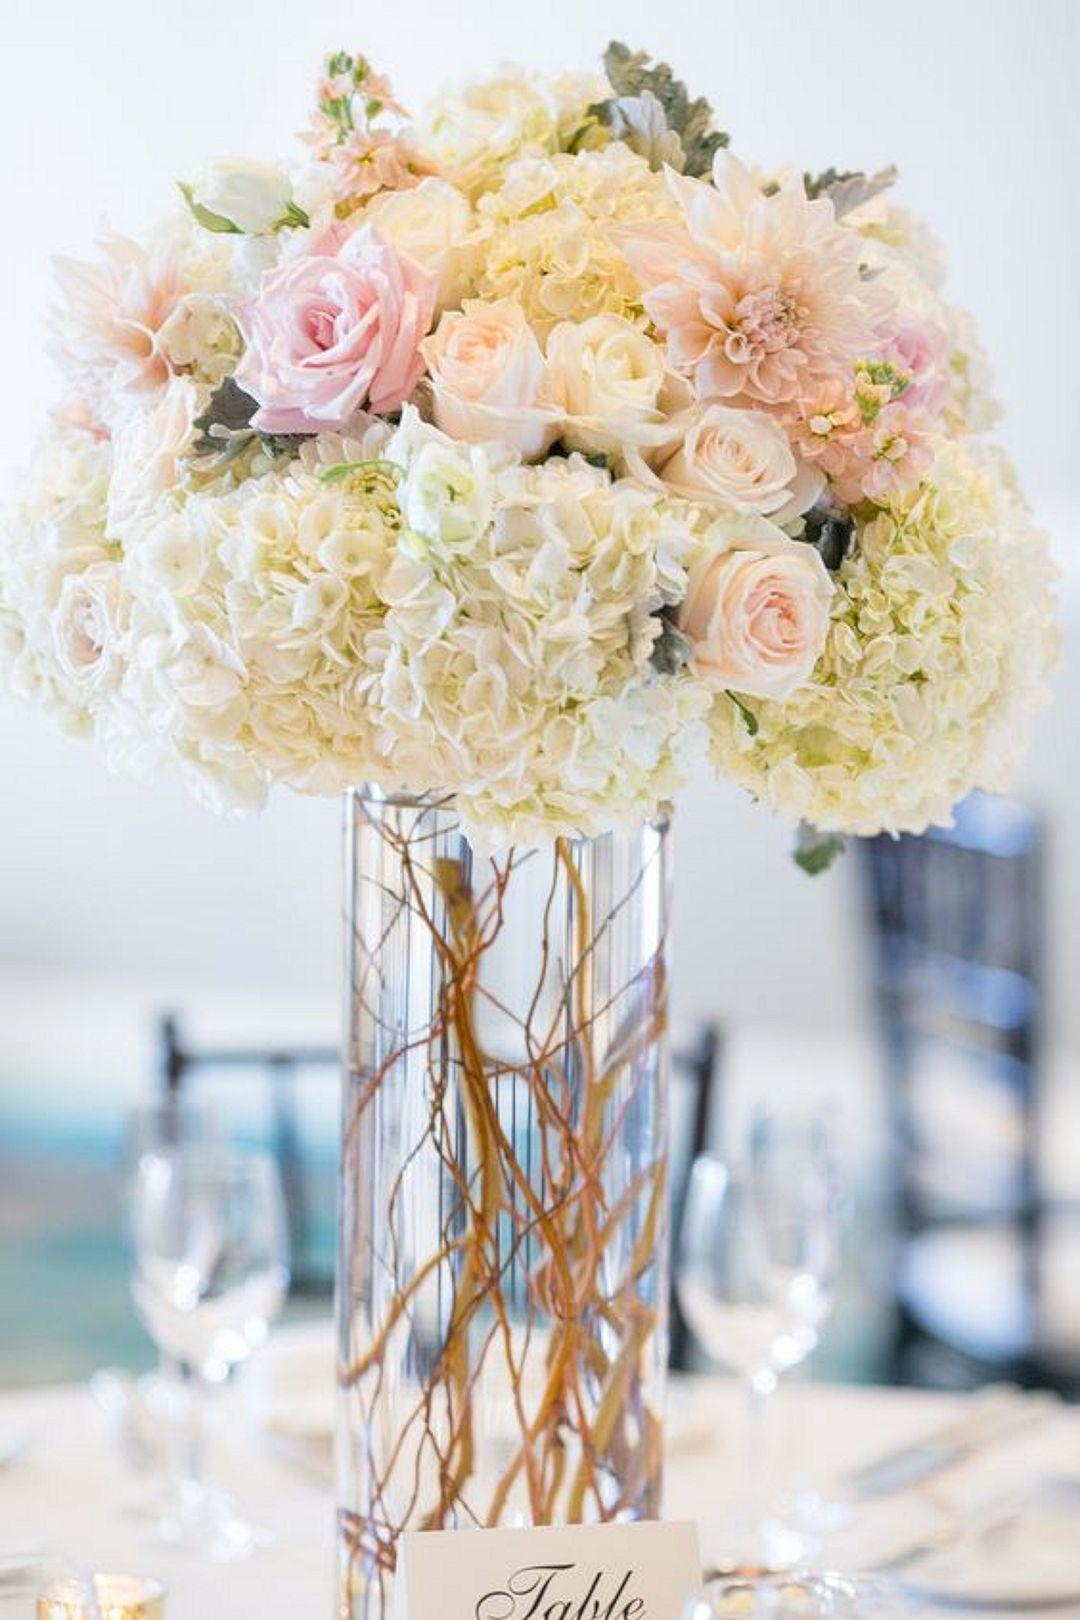 09 DIY Creative Rustic Chic Wedding Centerpieces Ideas   I do ...